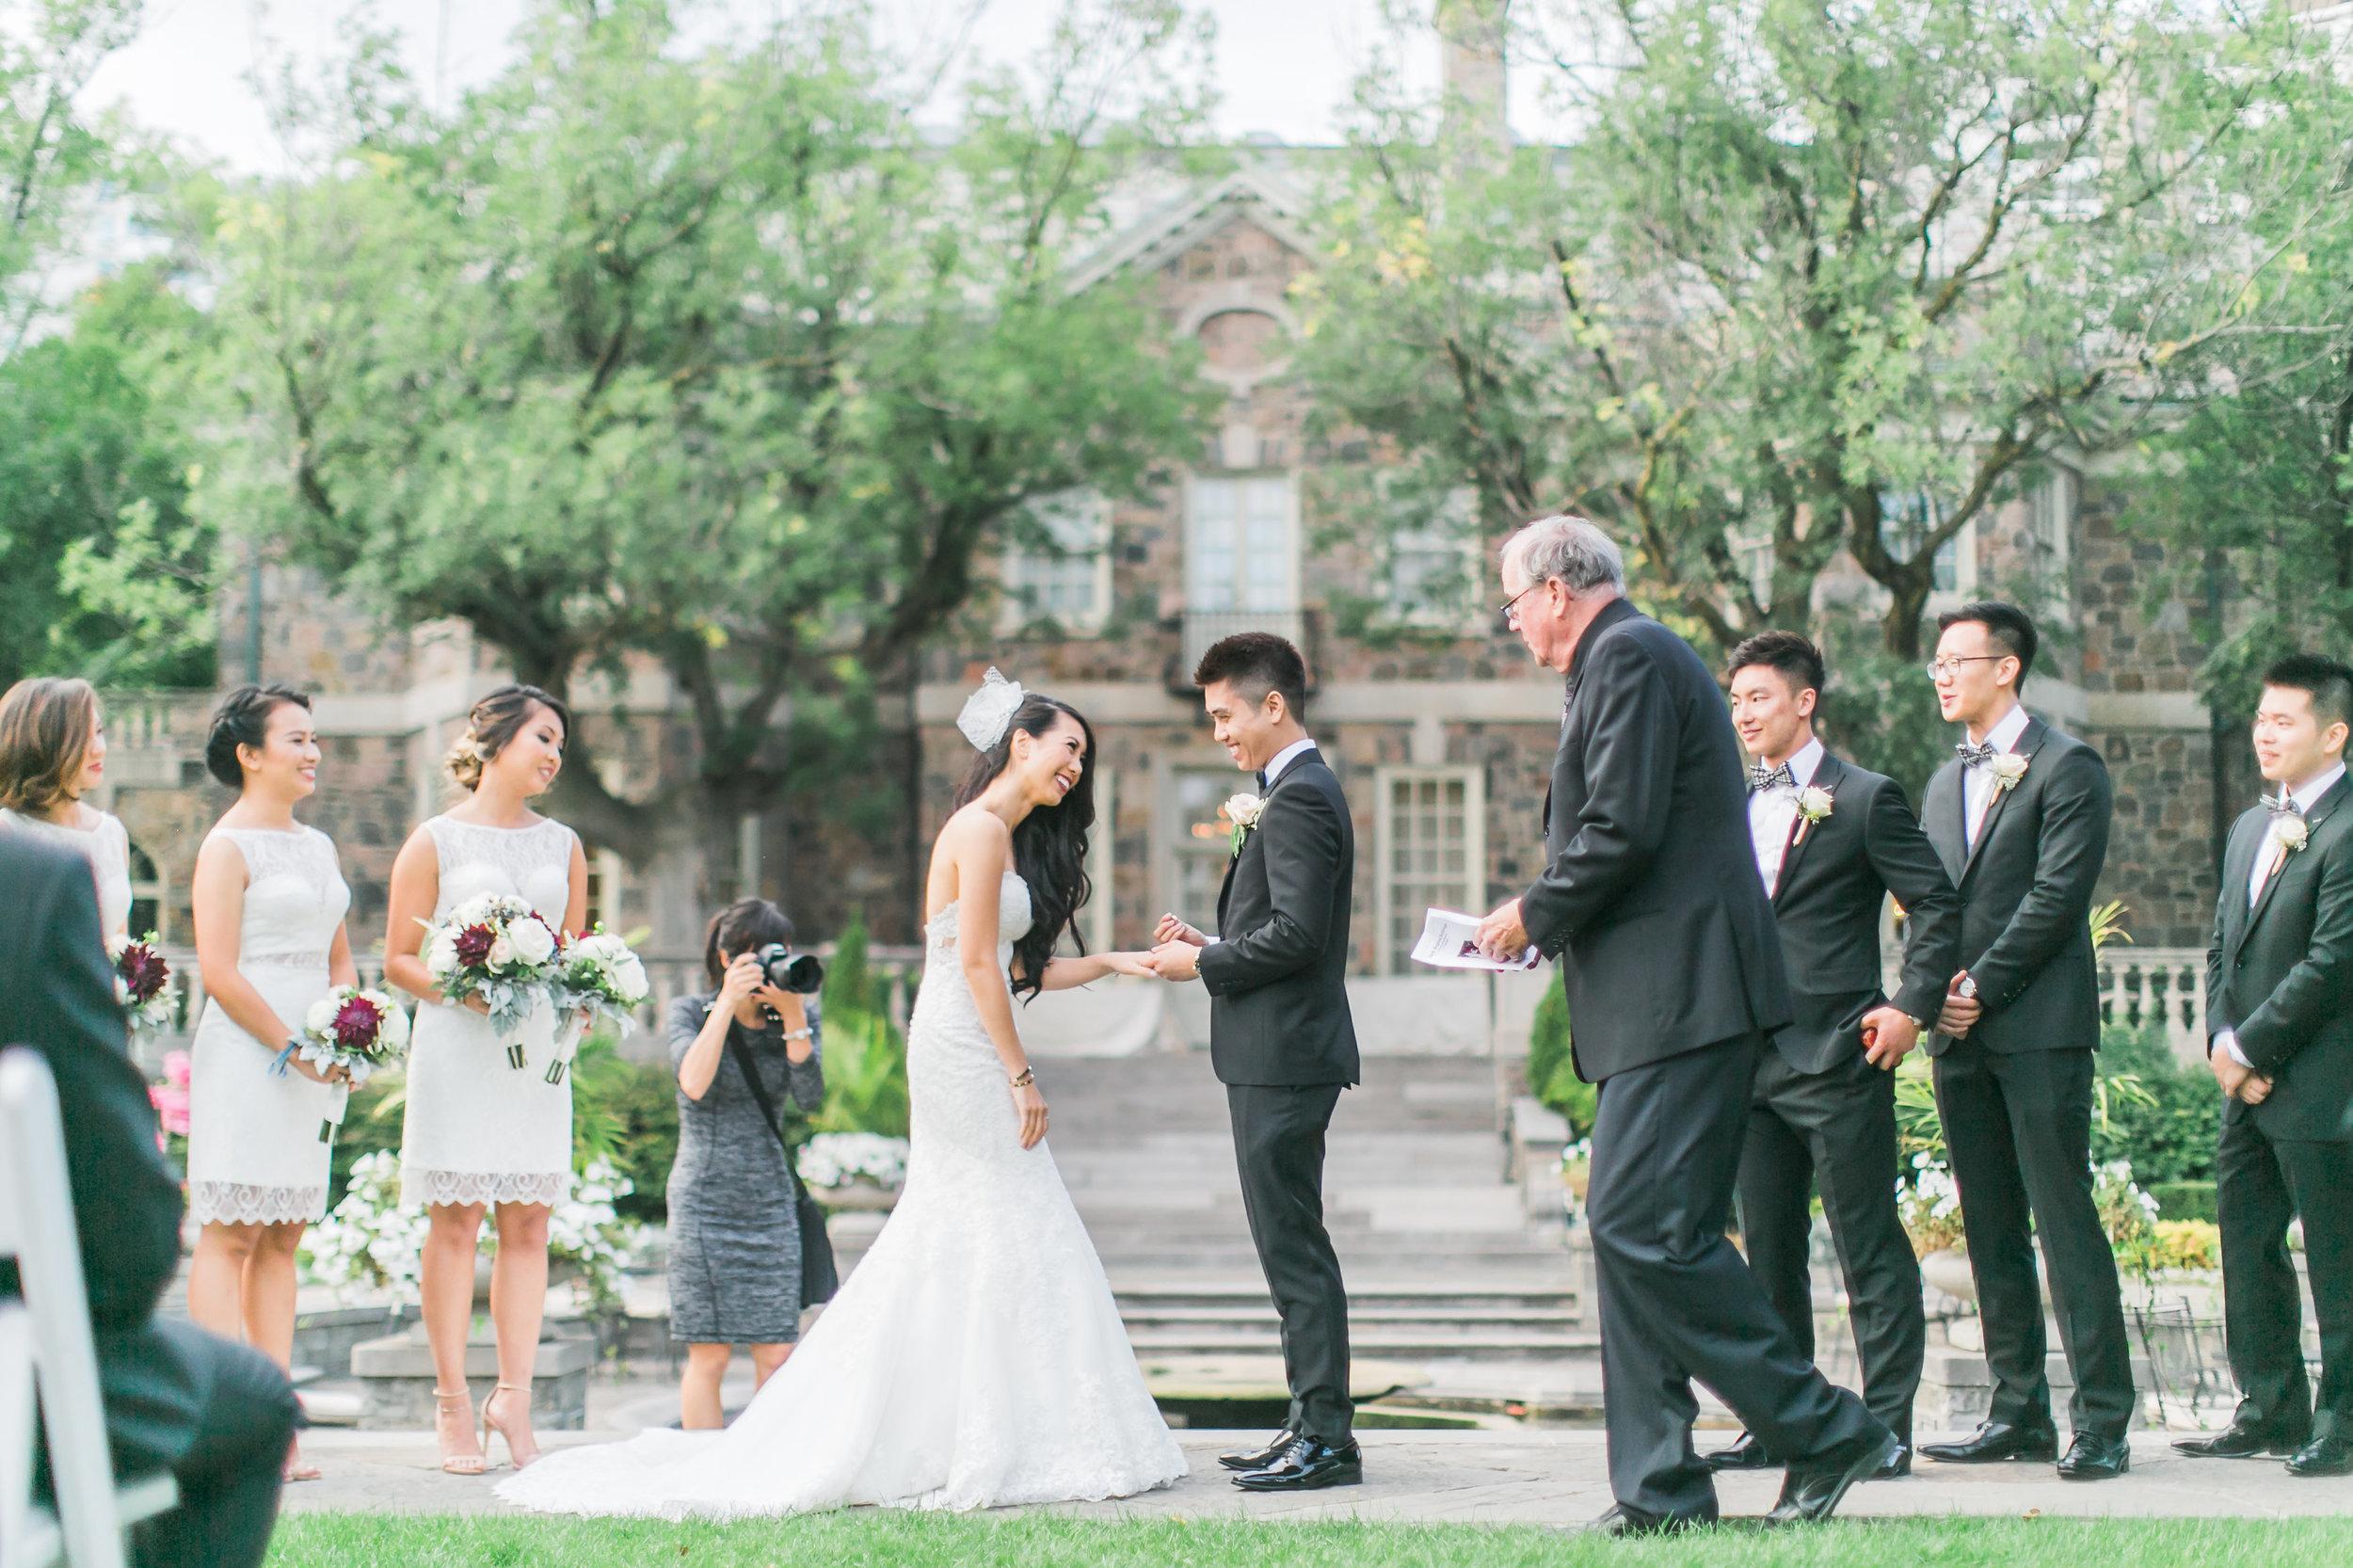 Phoebe Lo Events Toronto Wedding - Graydon Hall Manor Garden Charm Event 023.jpg